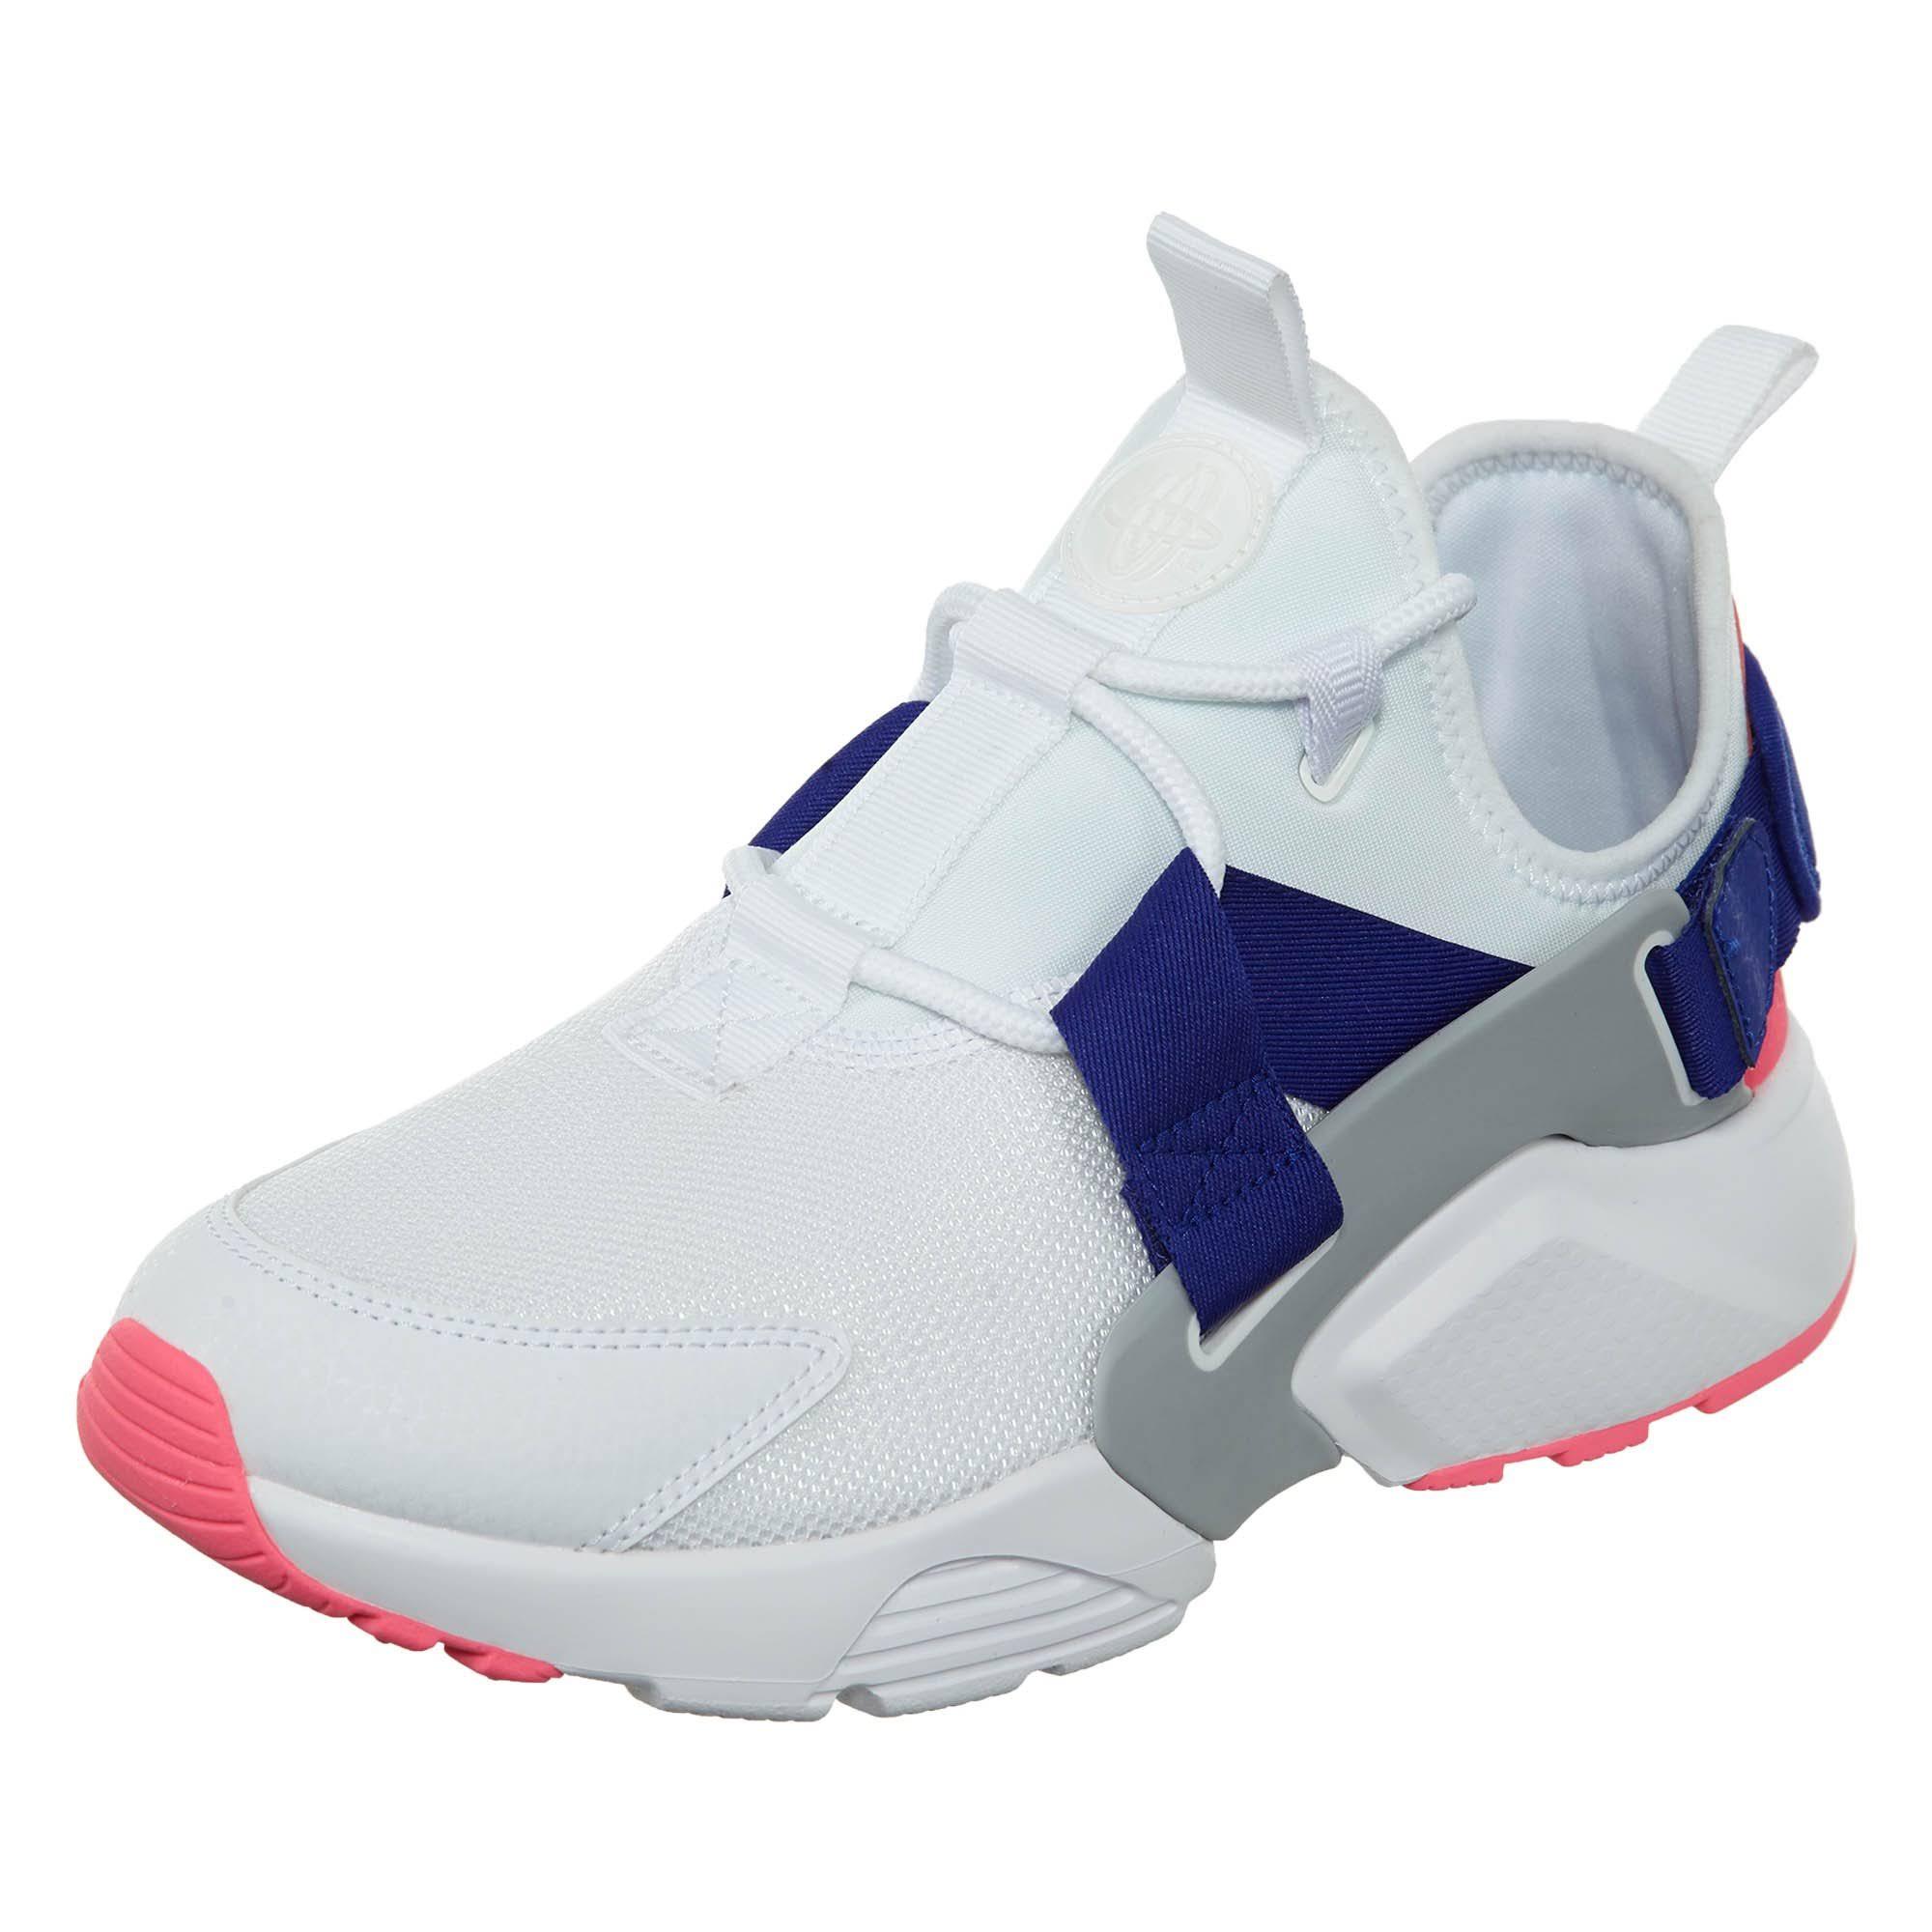 Nike Sneakers Ah6804 101 Womens White Air City Huarache Low 7F1A7Pr